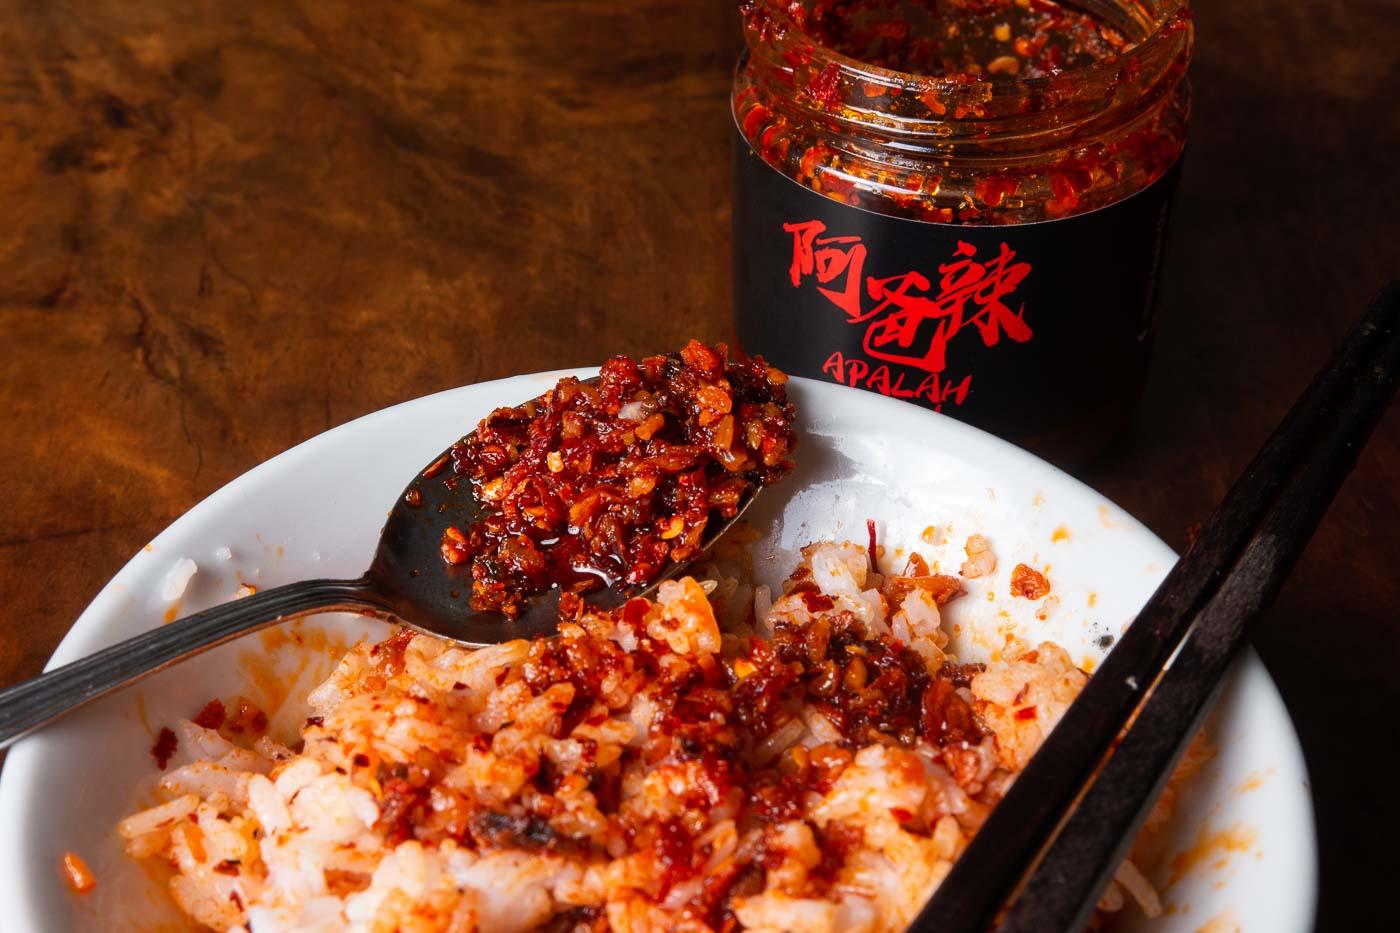 Apalah Chili Rice 3